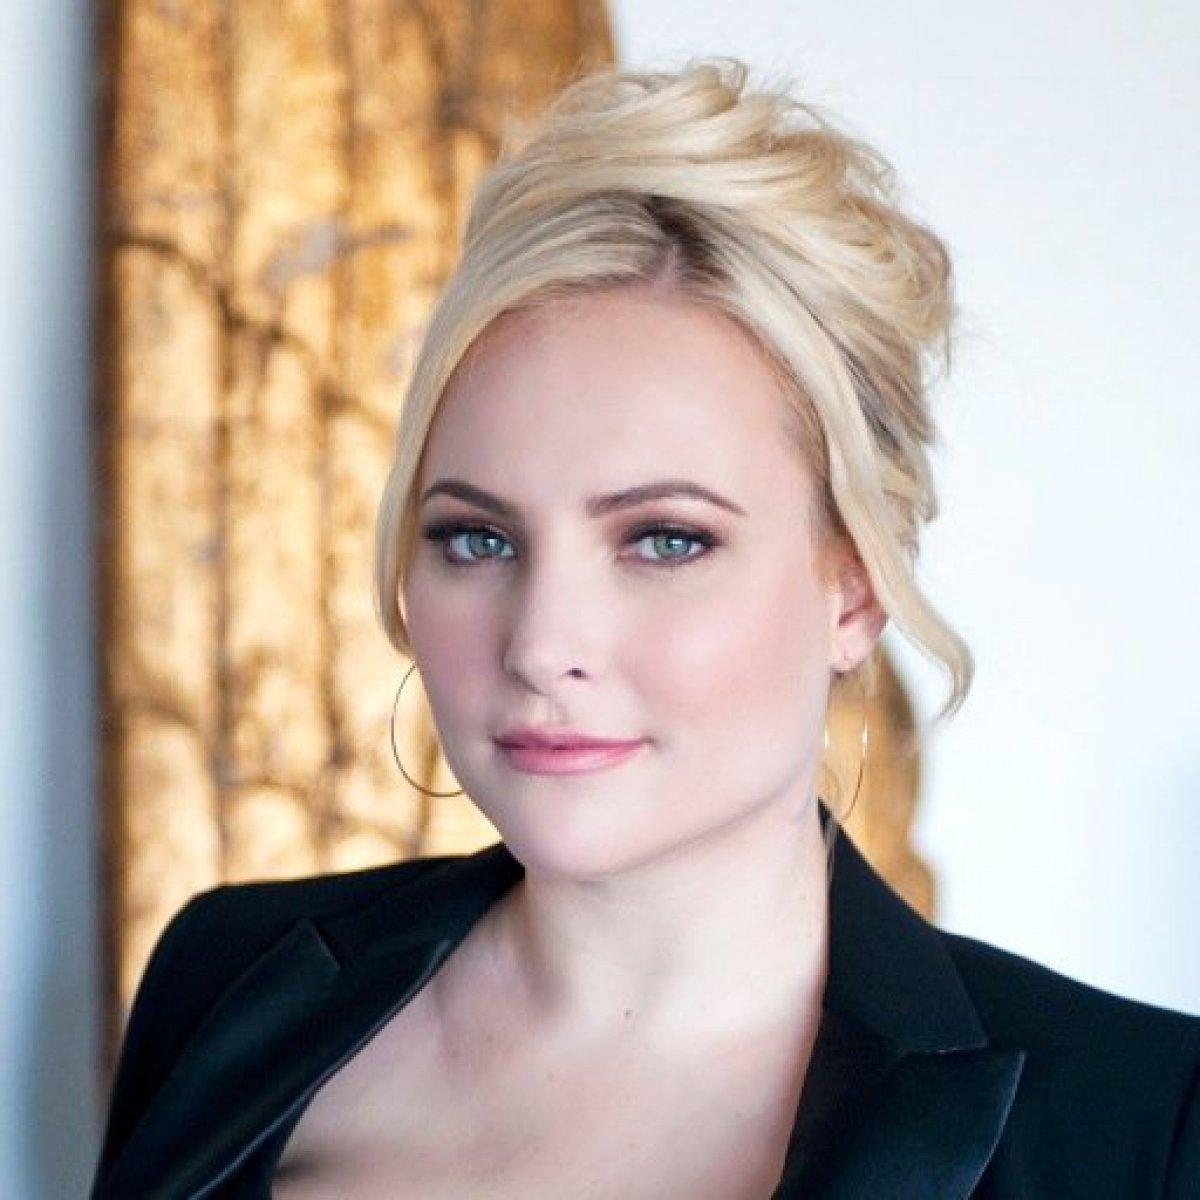 Meghan Mccain Partner: Meghan McCain Engaged To Writer Ben Domenech